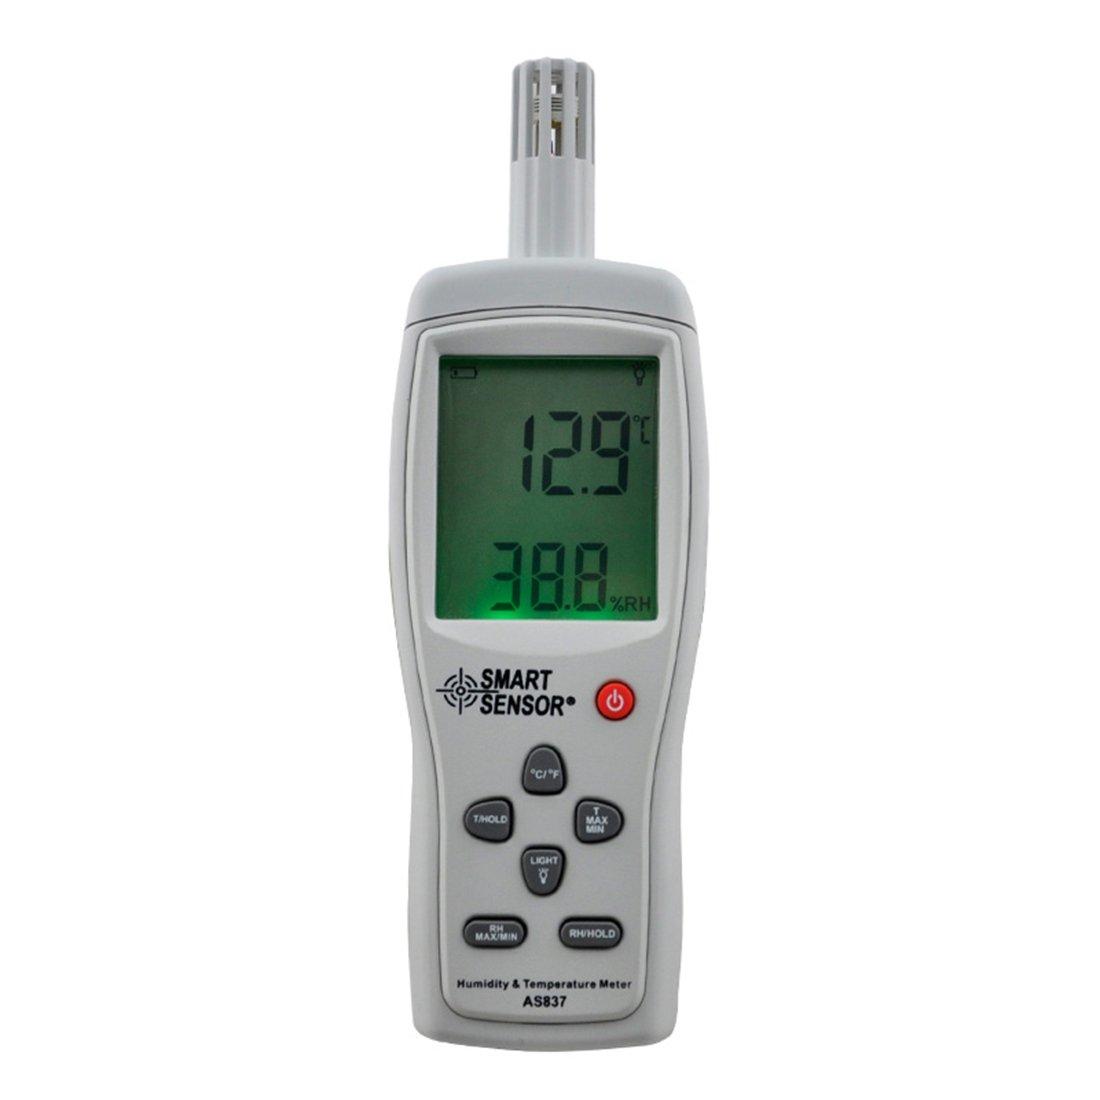 Smartsensor AS837 Hygrometer Digital Temperature and Humidity Meter, Temperature and Humidity(-10~50C 5%~98%RH) for Home and Industrial